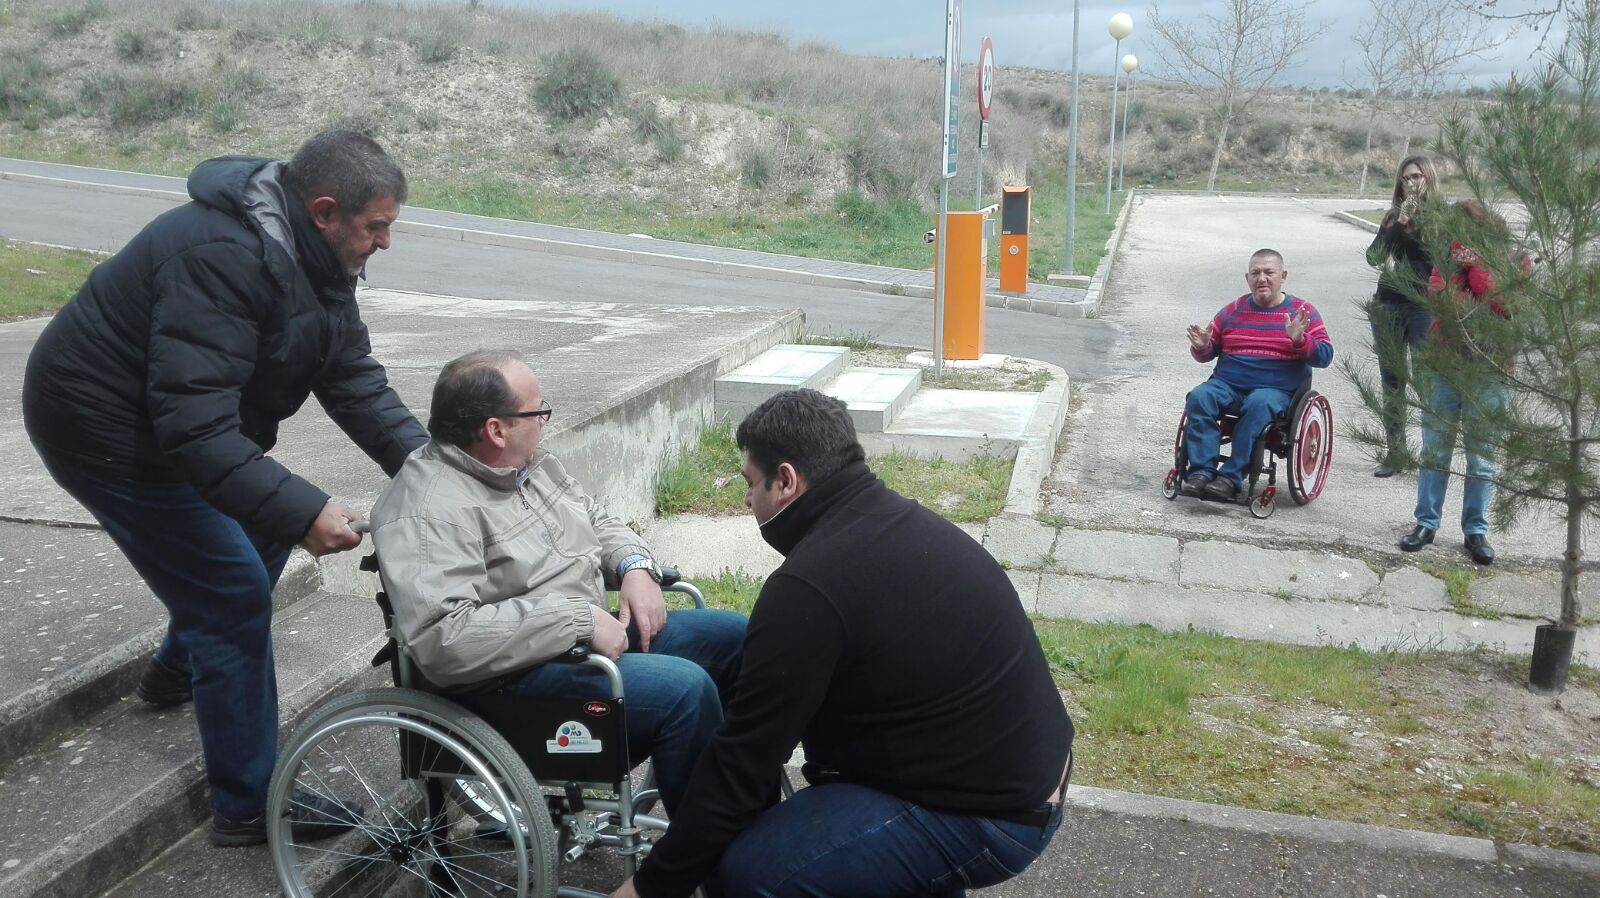 Emergencias discapacidad ENPC - Asociación DIA (2)